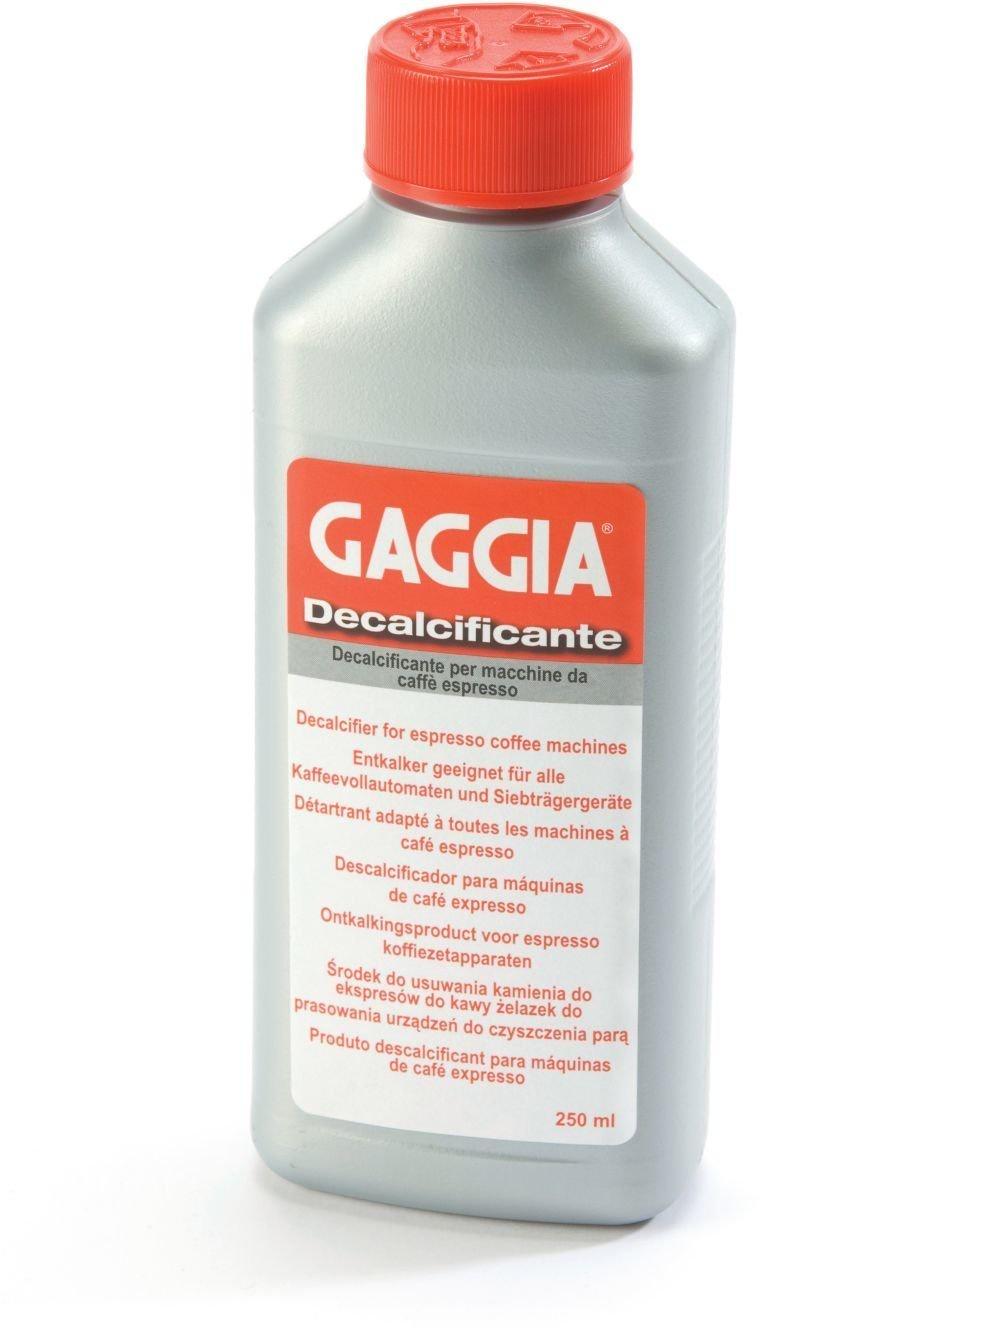 Gaggia Decalcificante, жидкость для декальцинации , 250 мл kaffit com kft 01 средство для декальцинации 4 шт